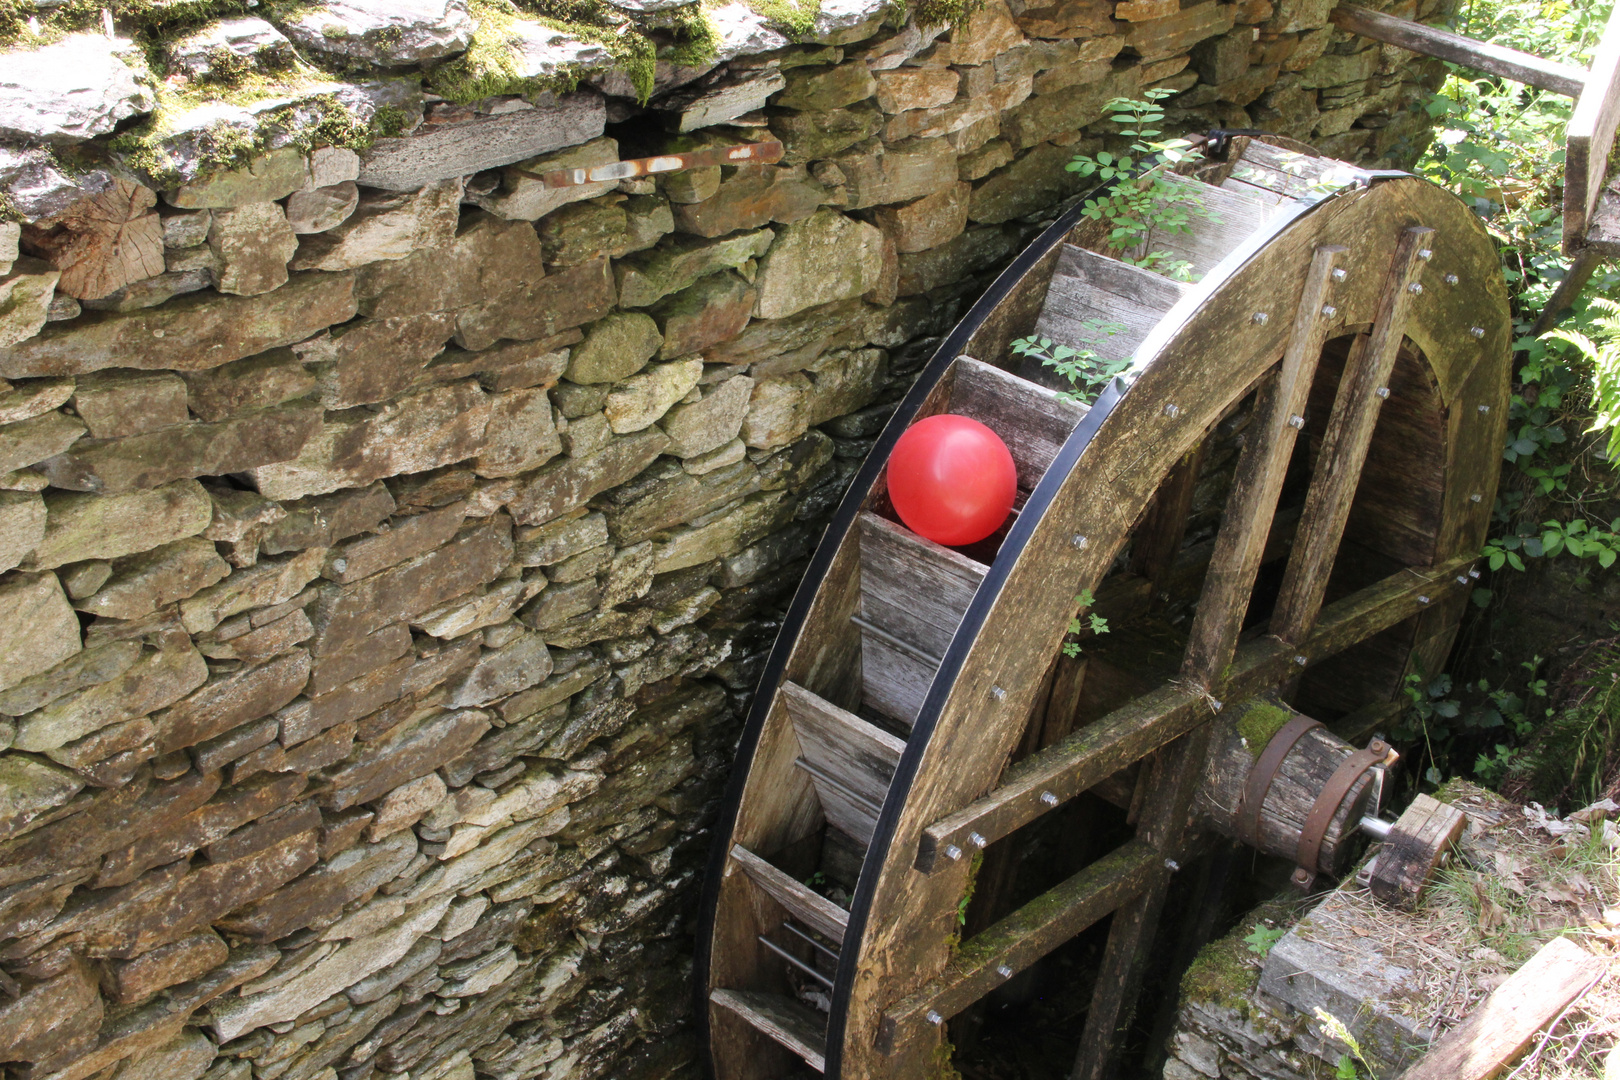 Roter Ballon im Wasserrad